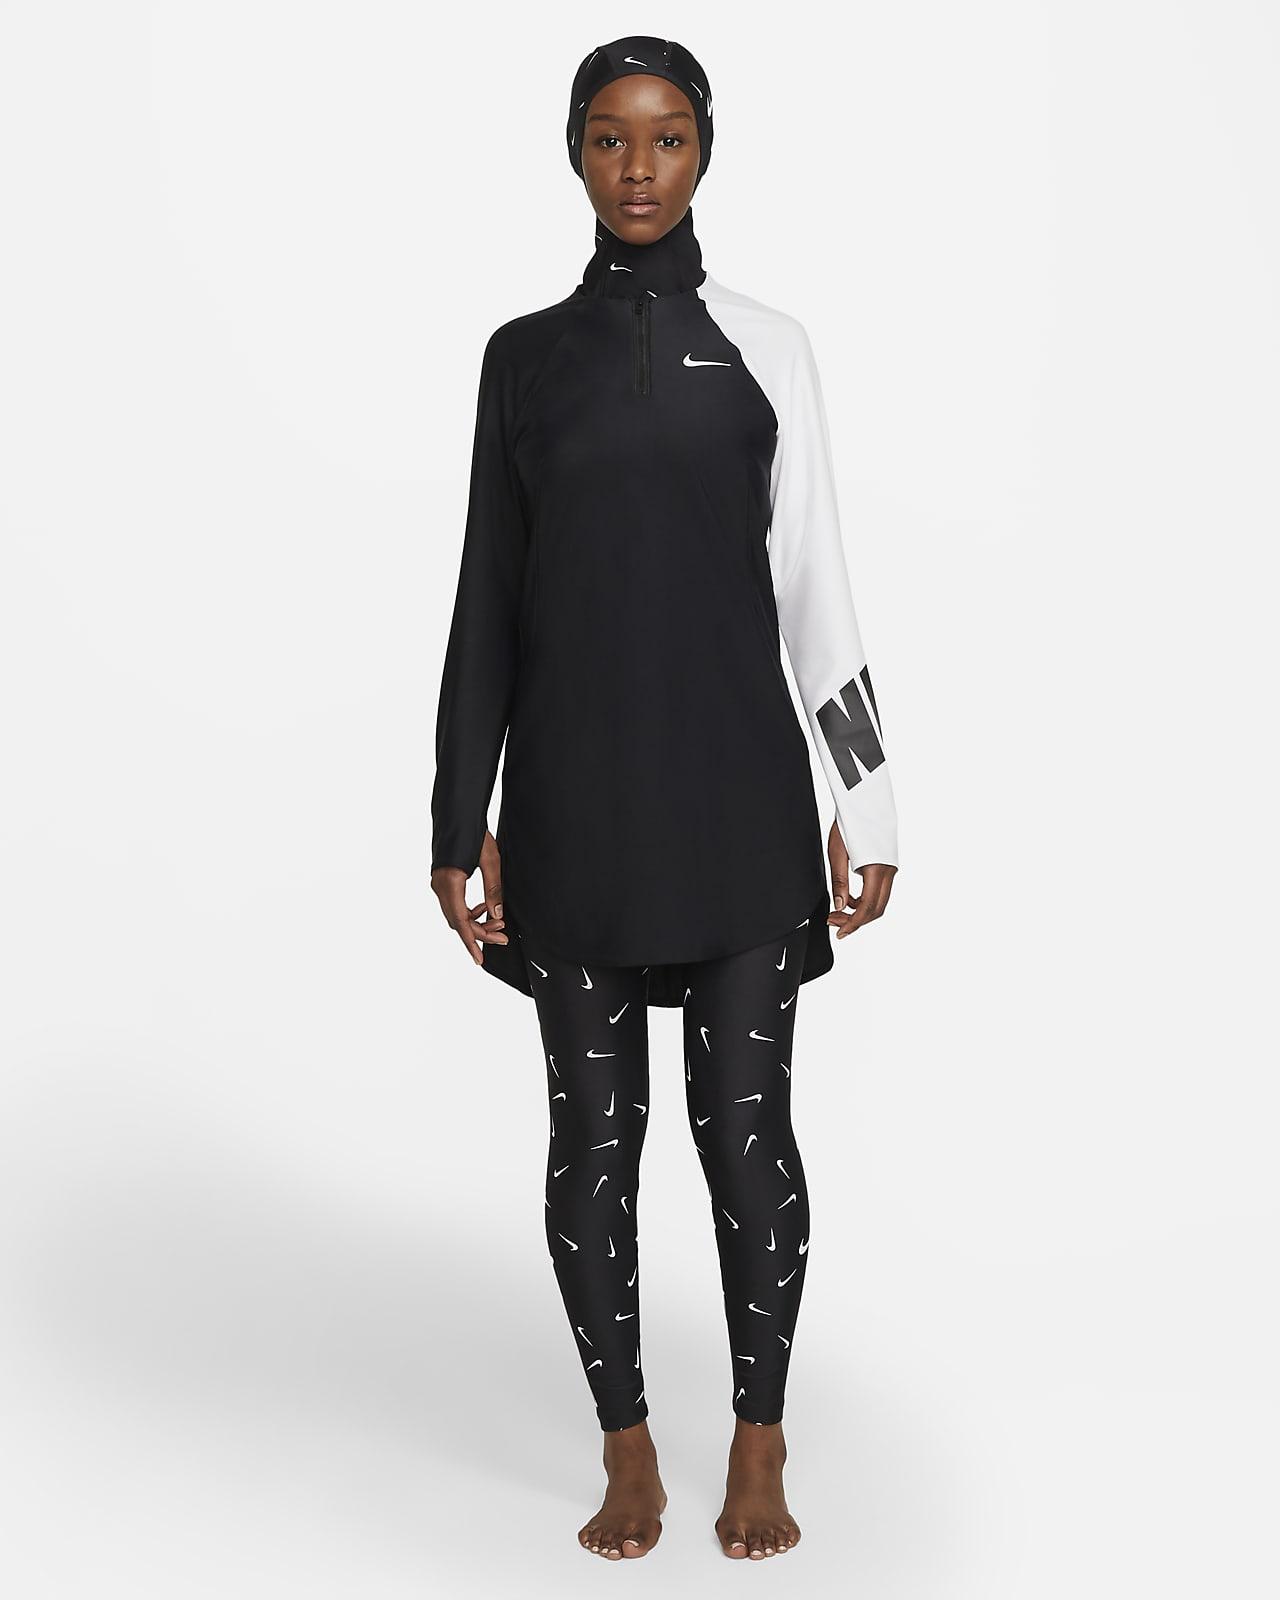 Nike Victory schmale Schwimm-Leggings für Damen